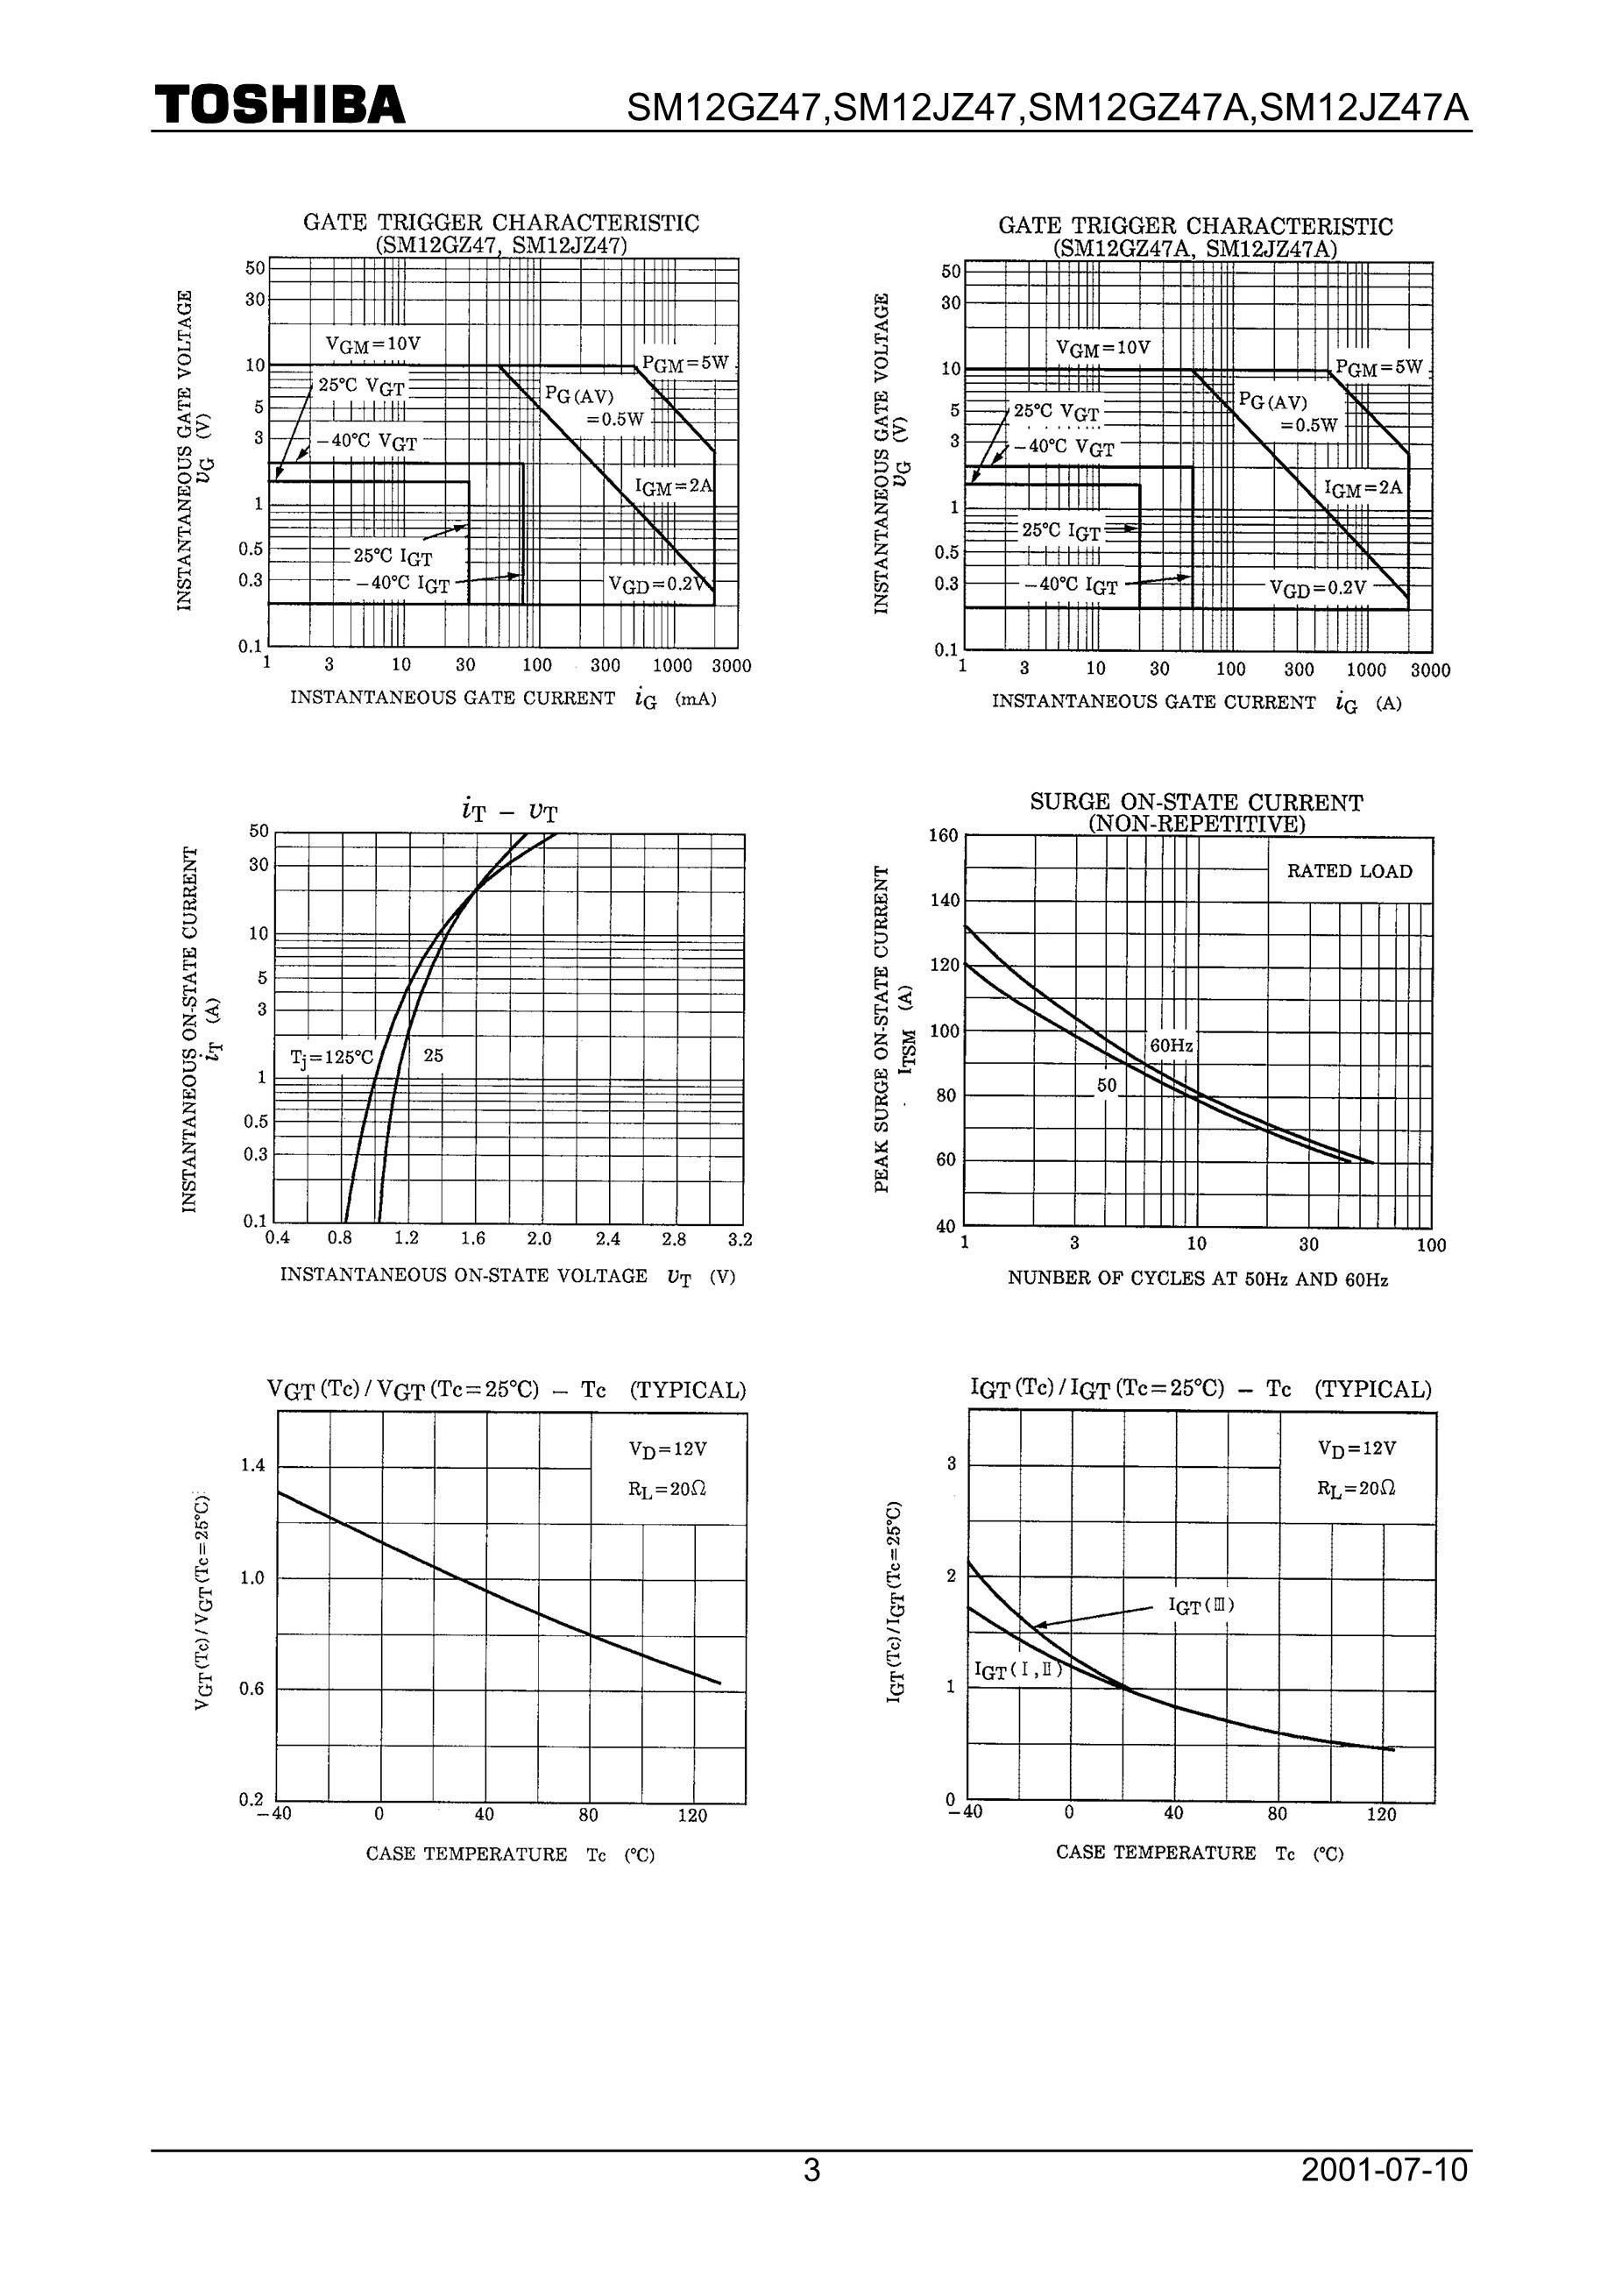 SM128M32U80MD1LLF-18BT's pdf picture 3